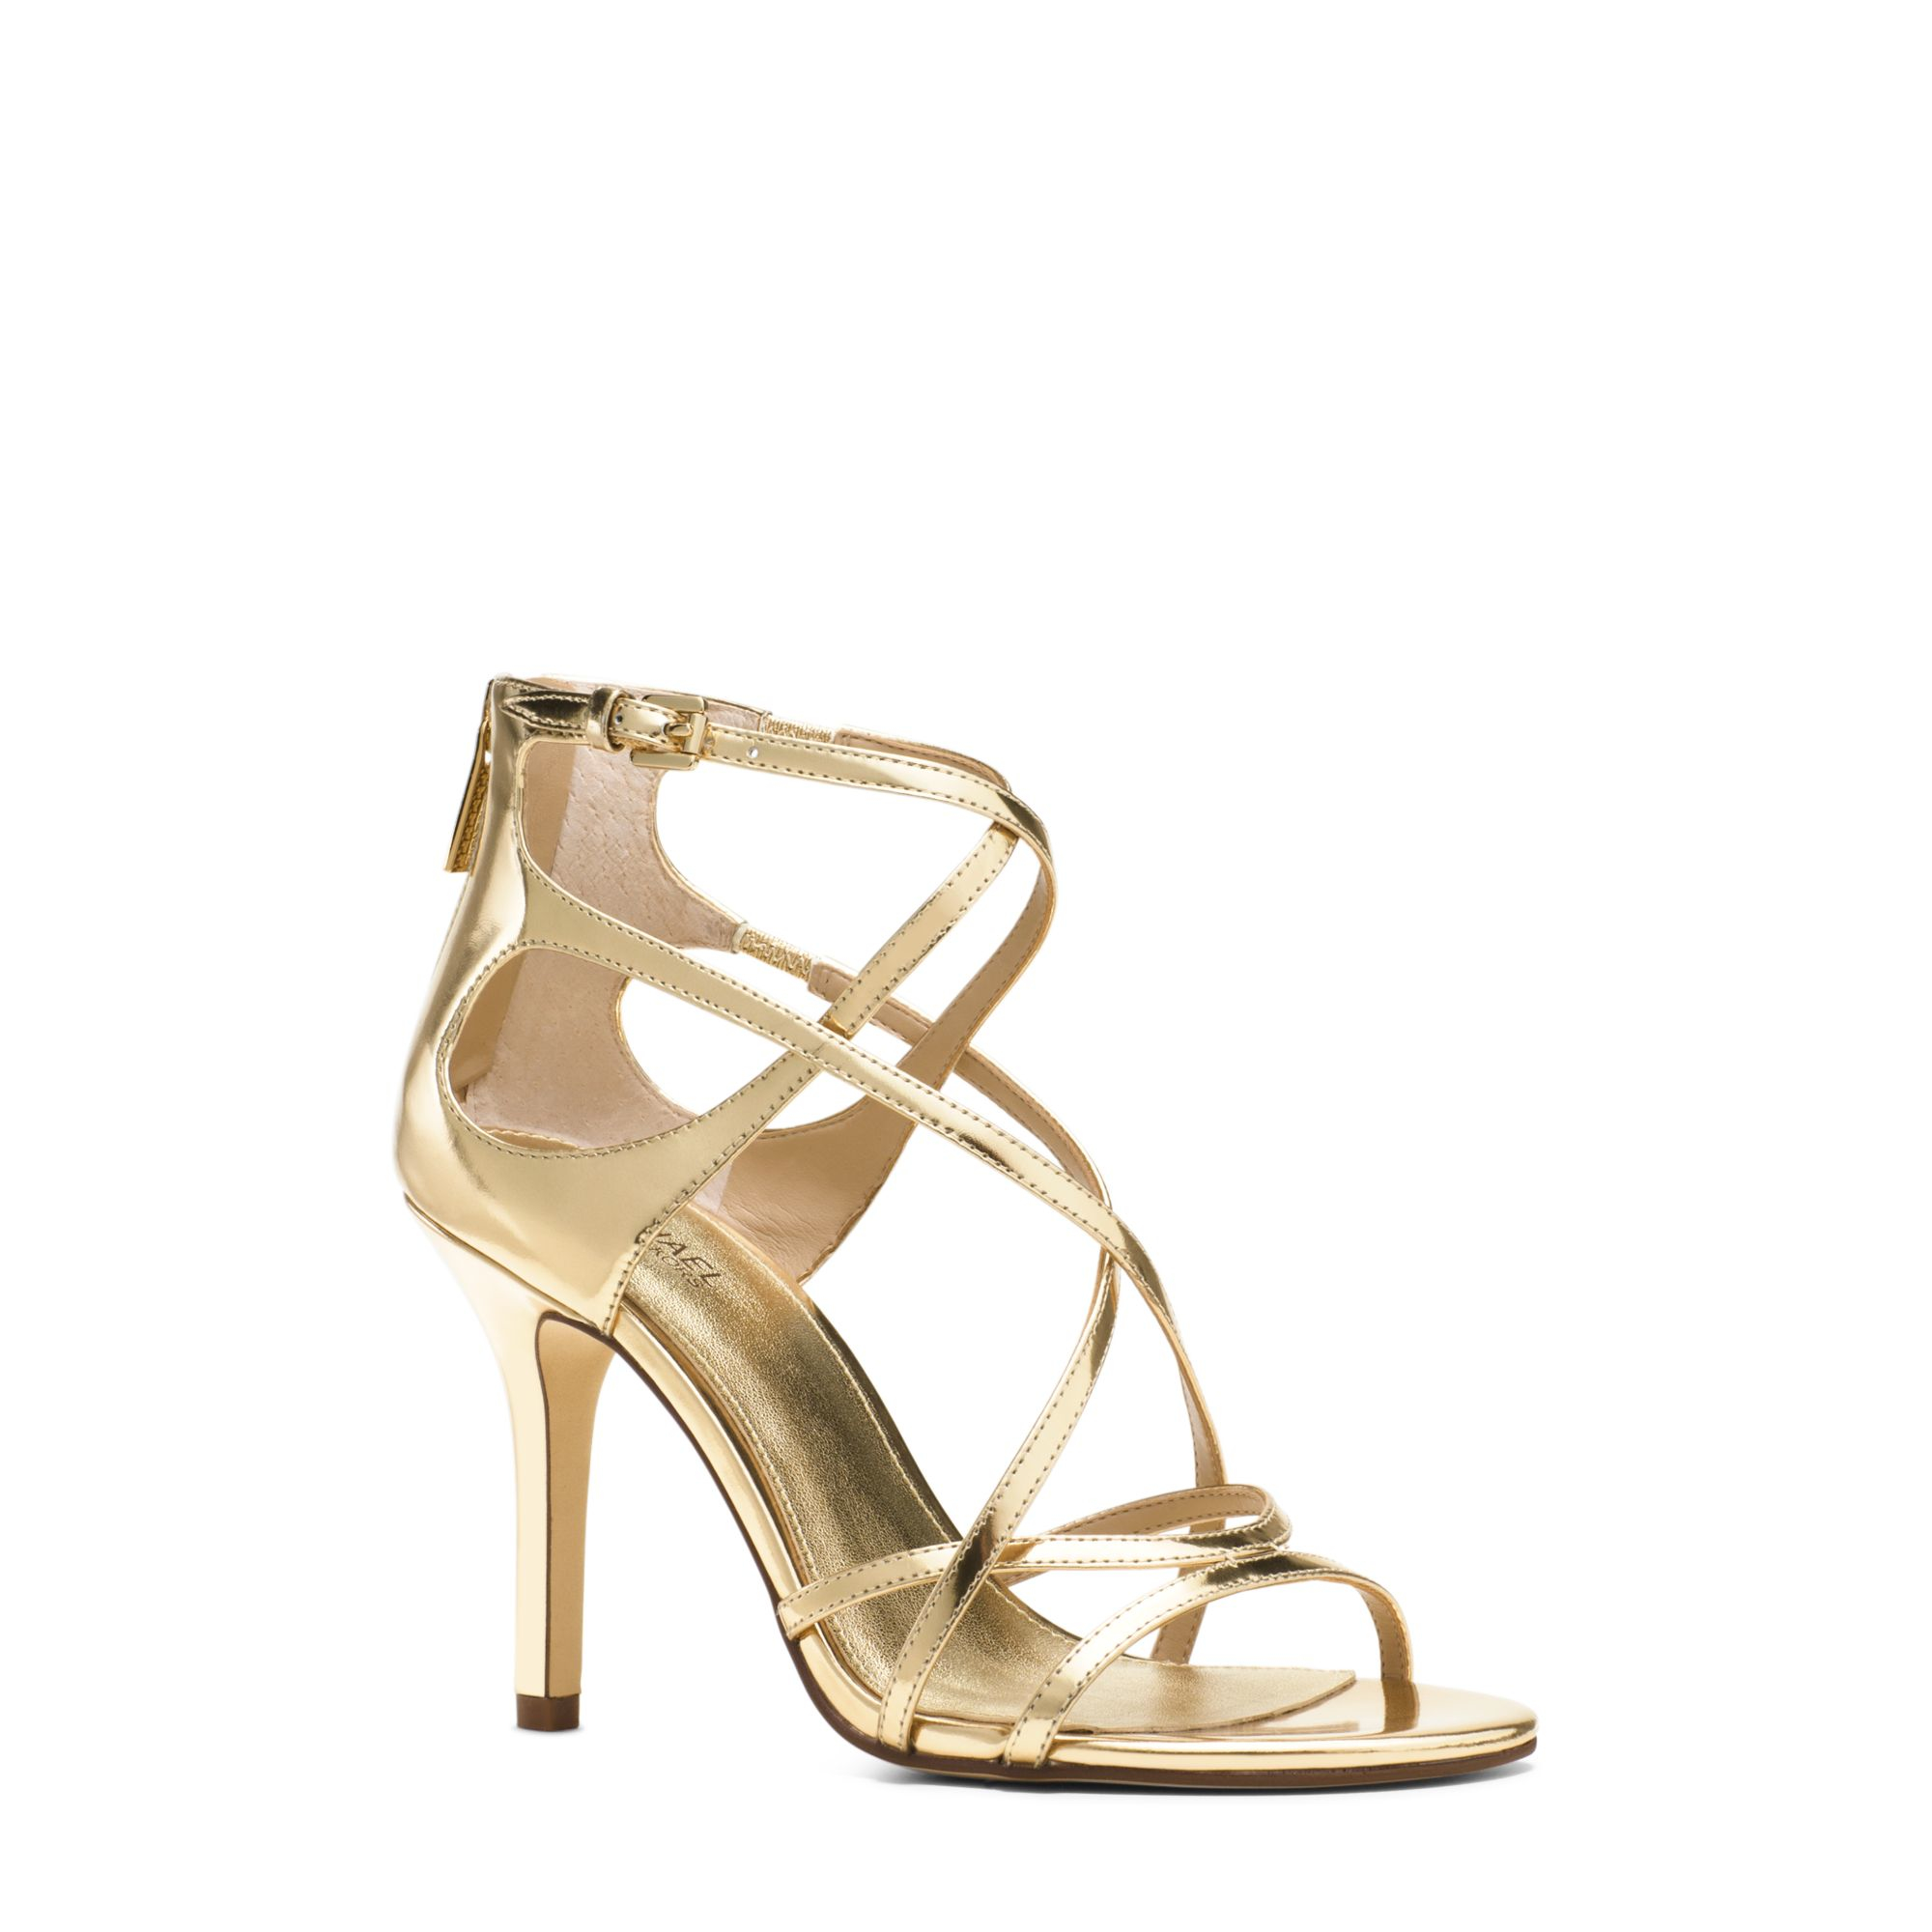 c78429bc56d6 Lyst - Michael Kors Linette Leather Sandal in Metallic